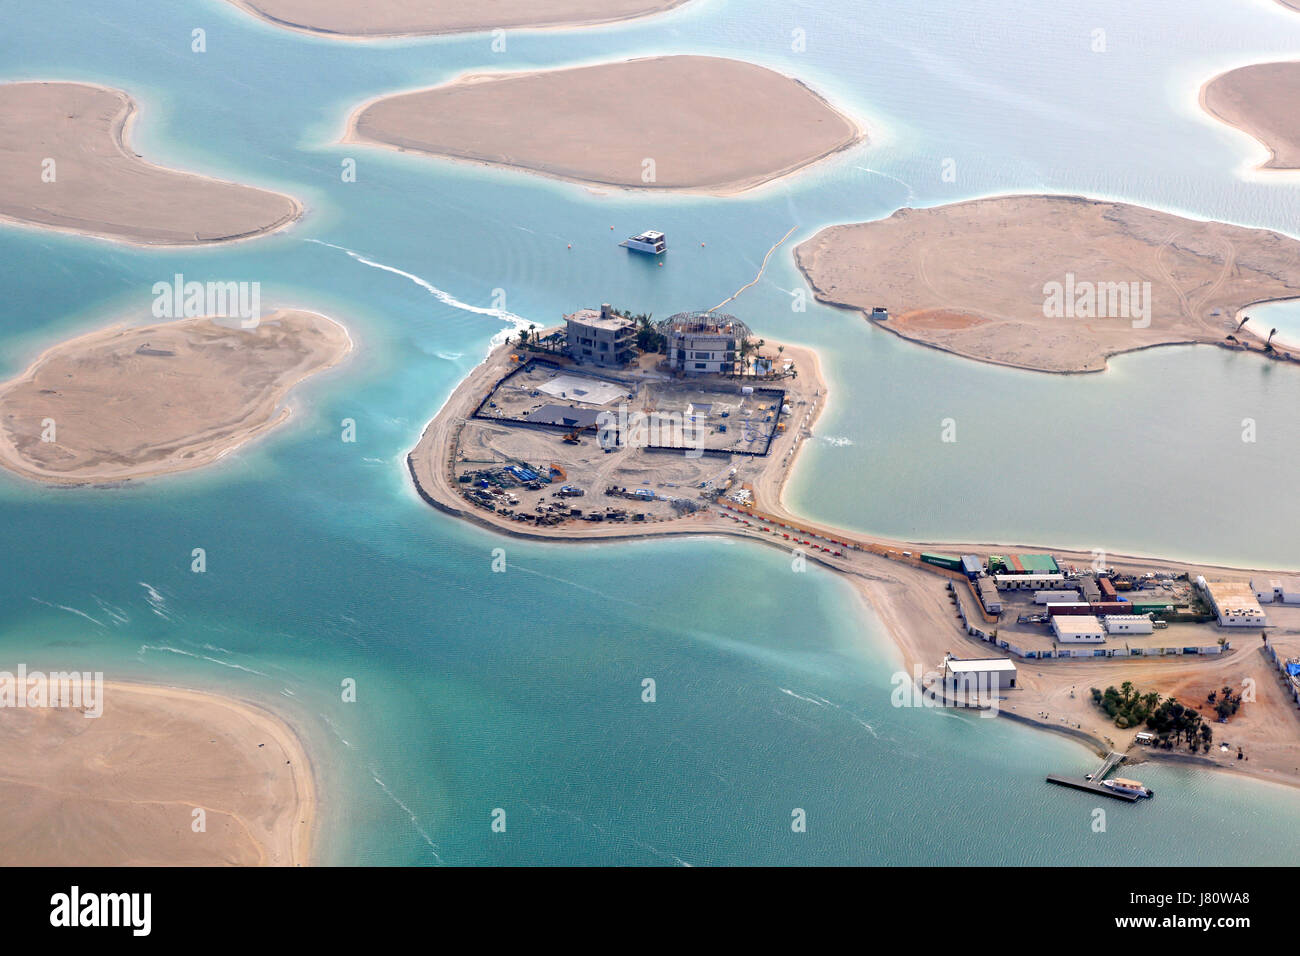 Dubai The World Islands Germany Austria Switzerland France Spain Netherlands Island aerial view photography UAE - Stock Image